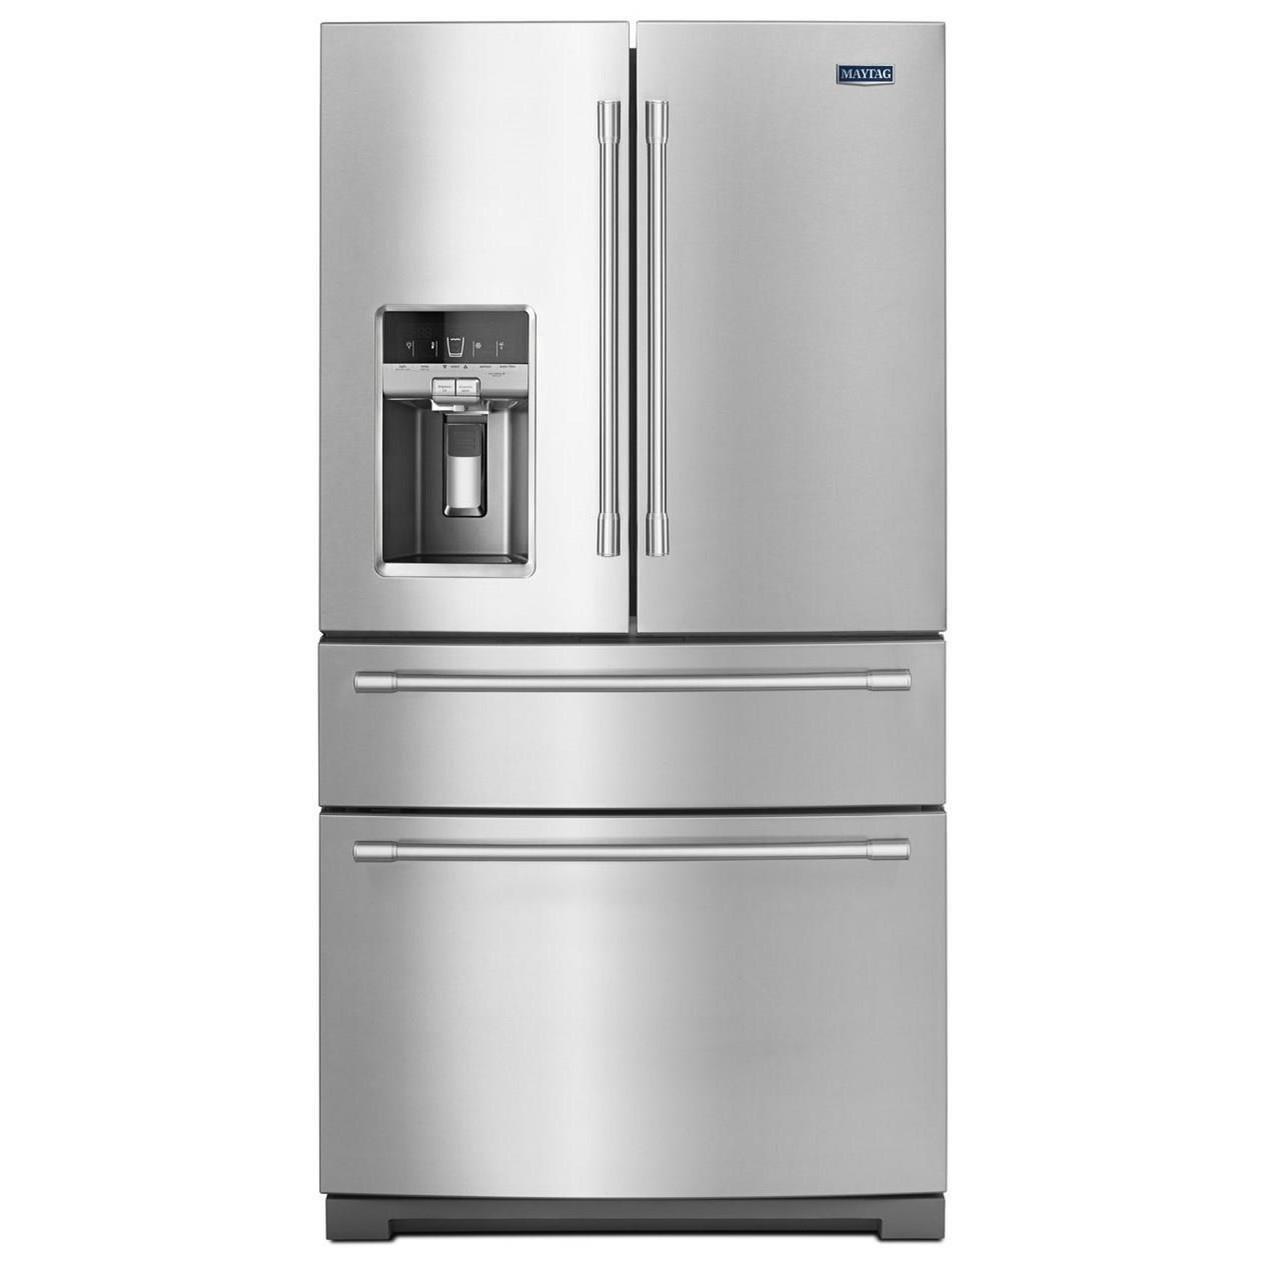 "Maytag French Door Refrigerators 36"" 26 Cu Ft 4-Door French Door Refrigerator by Maytag at Wilcox Furniture"